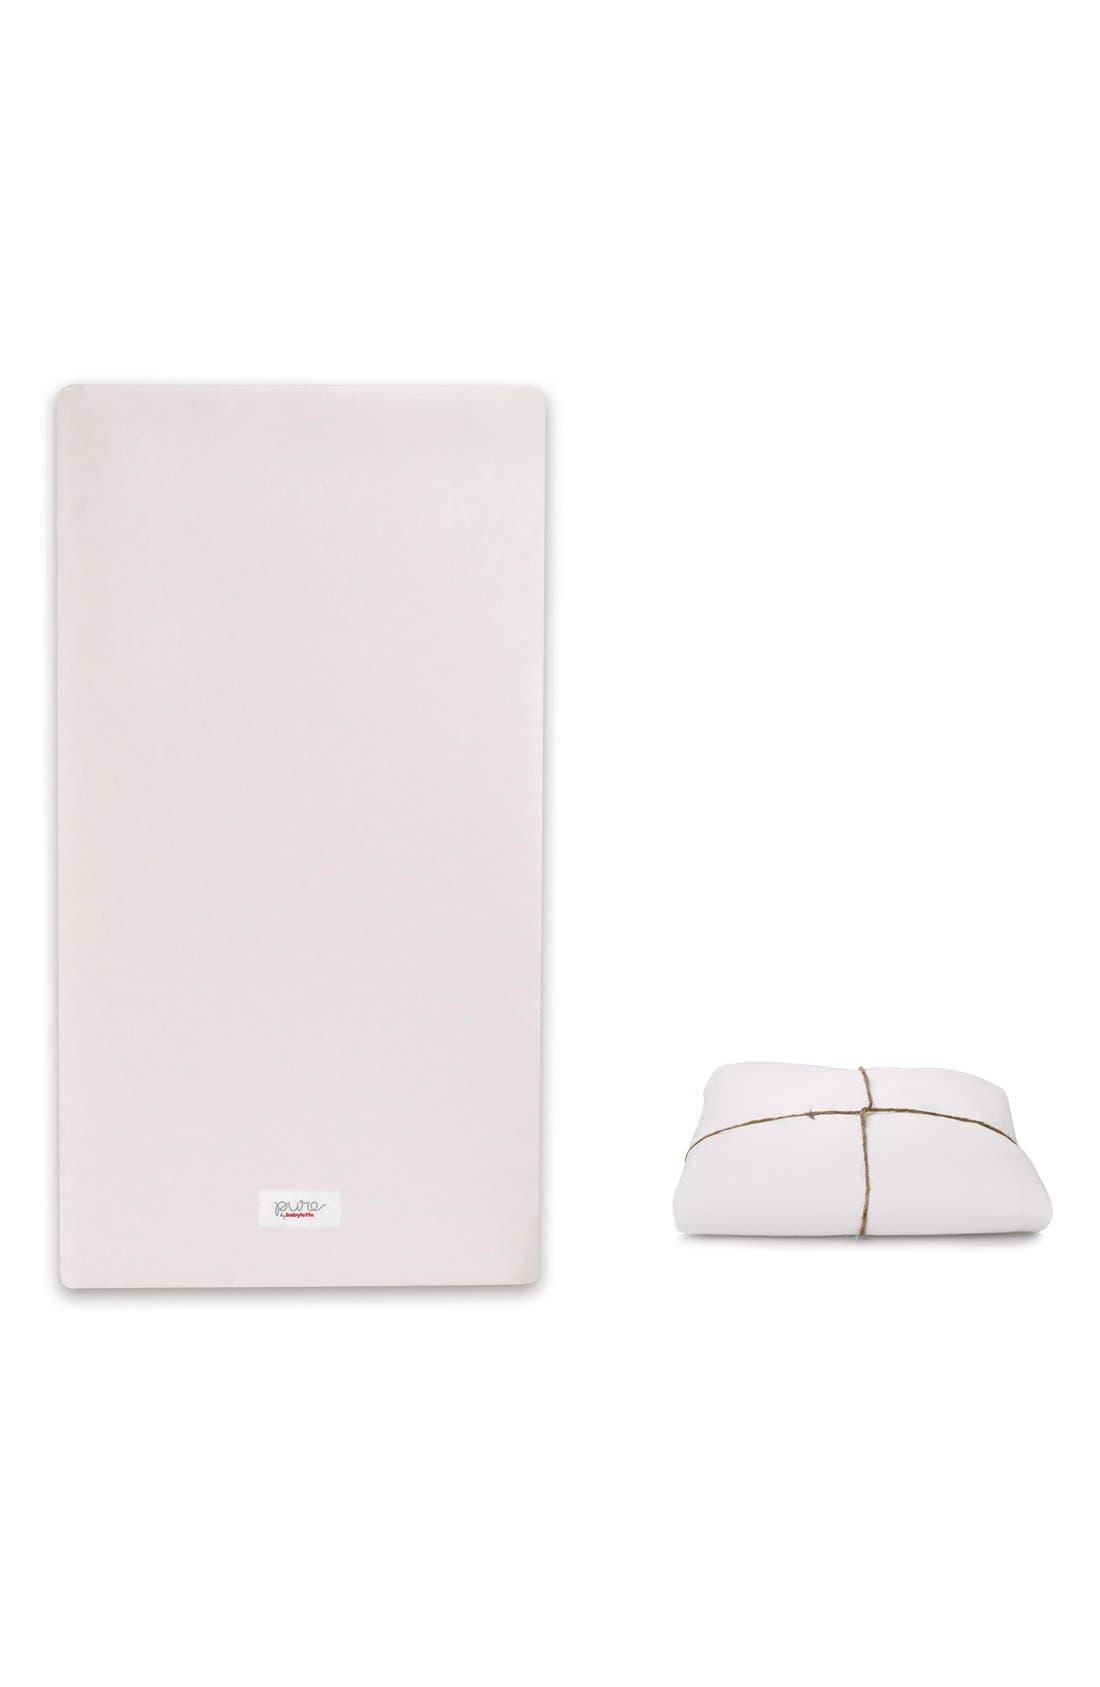 'Pure Core' Nontoxic Crib Mattress & DRY Waterproof Cover,                         Main,                         color, White